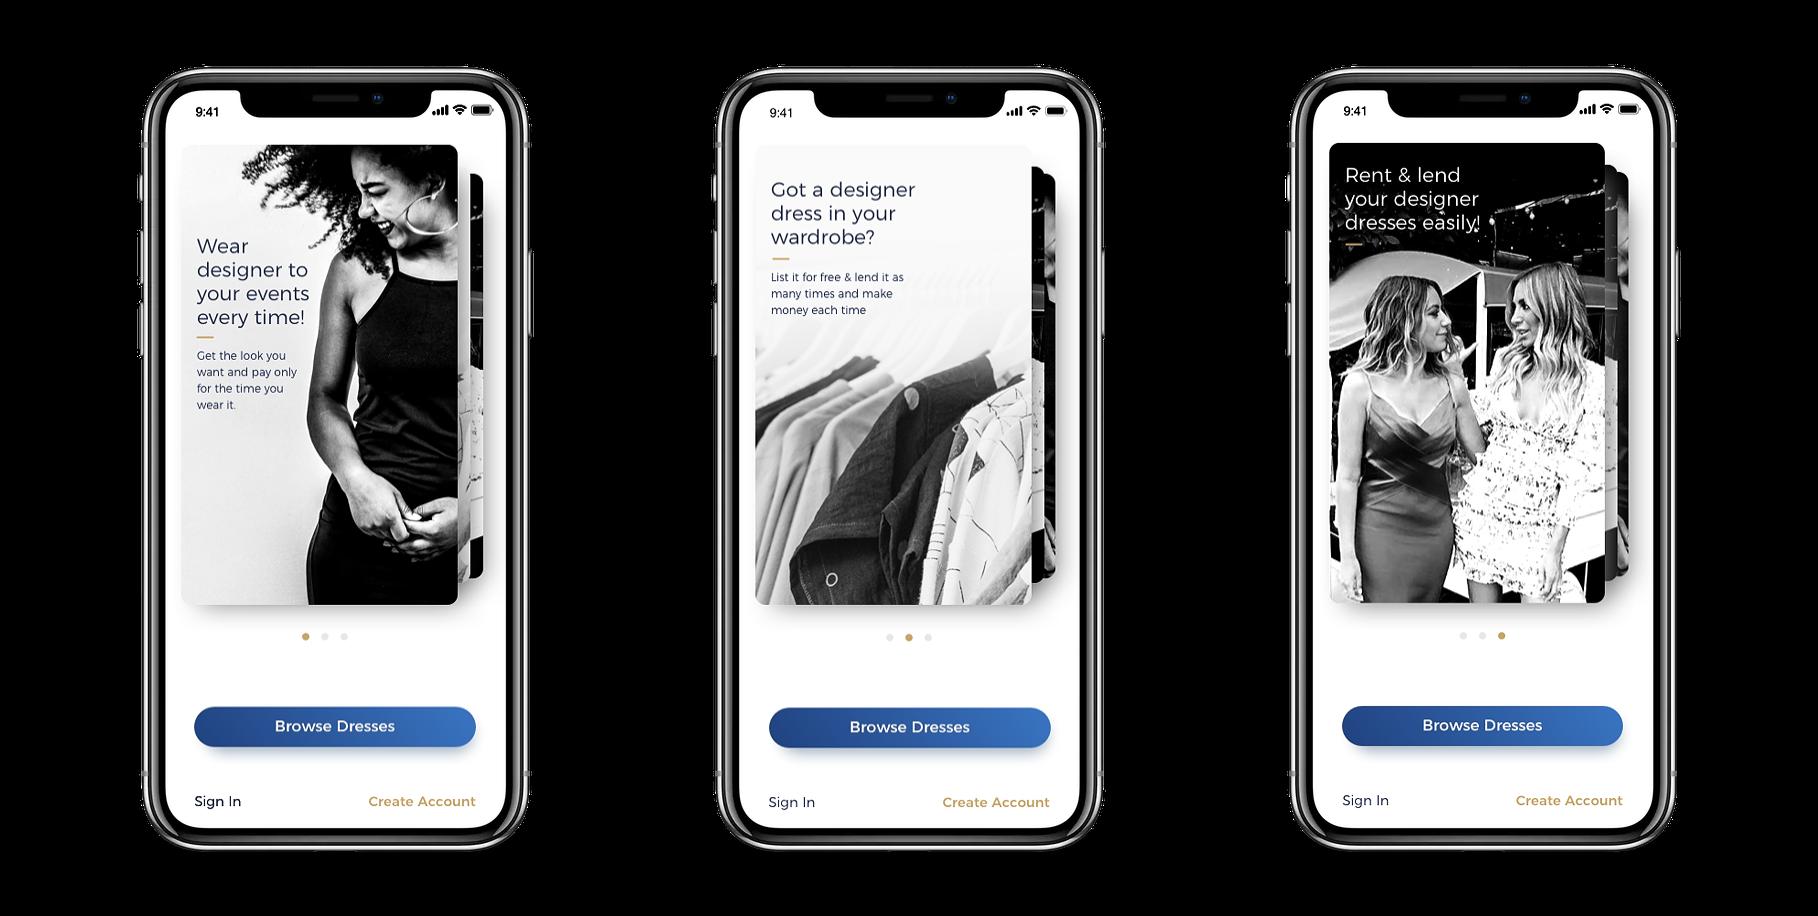 User interface design for dress sharing mobile app to rent dress in Sydney